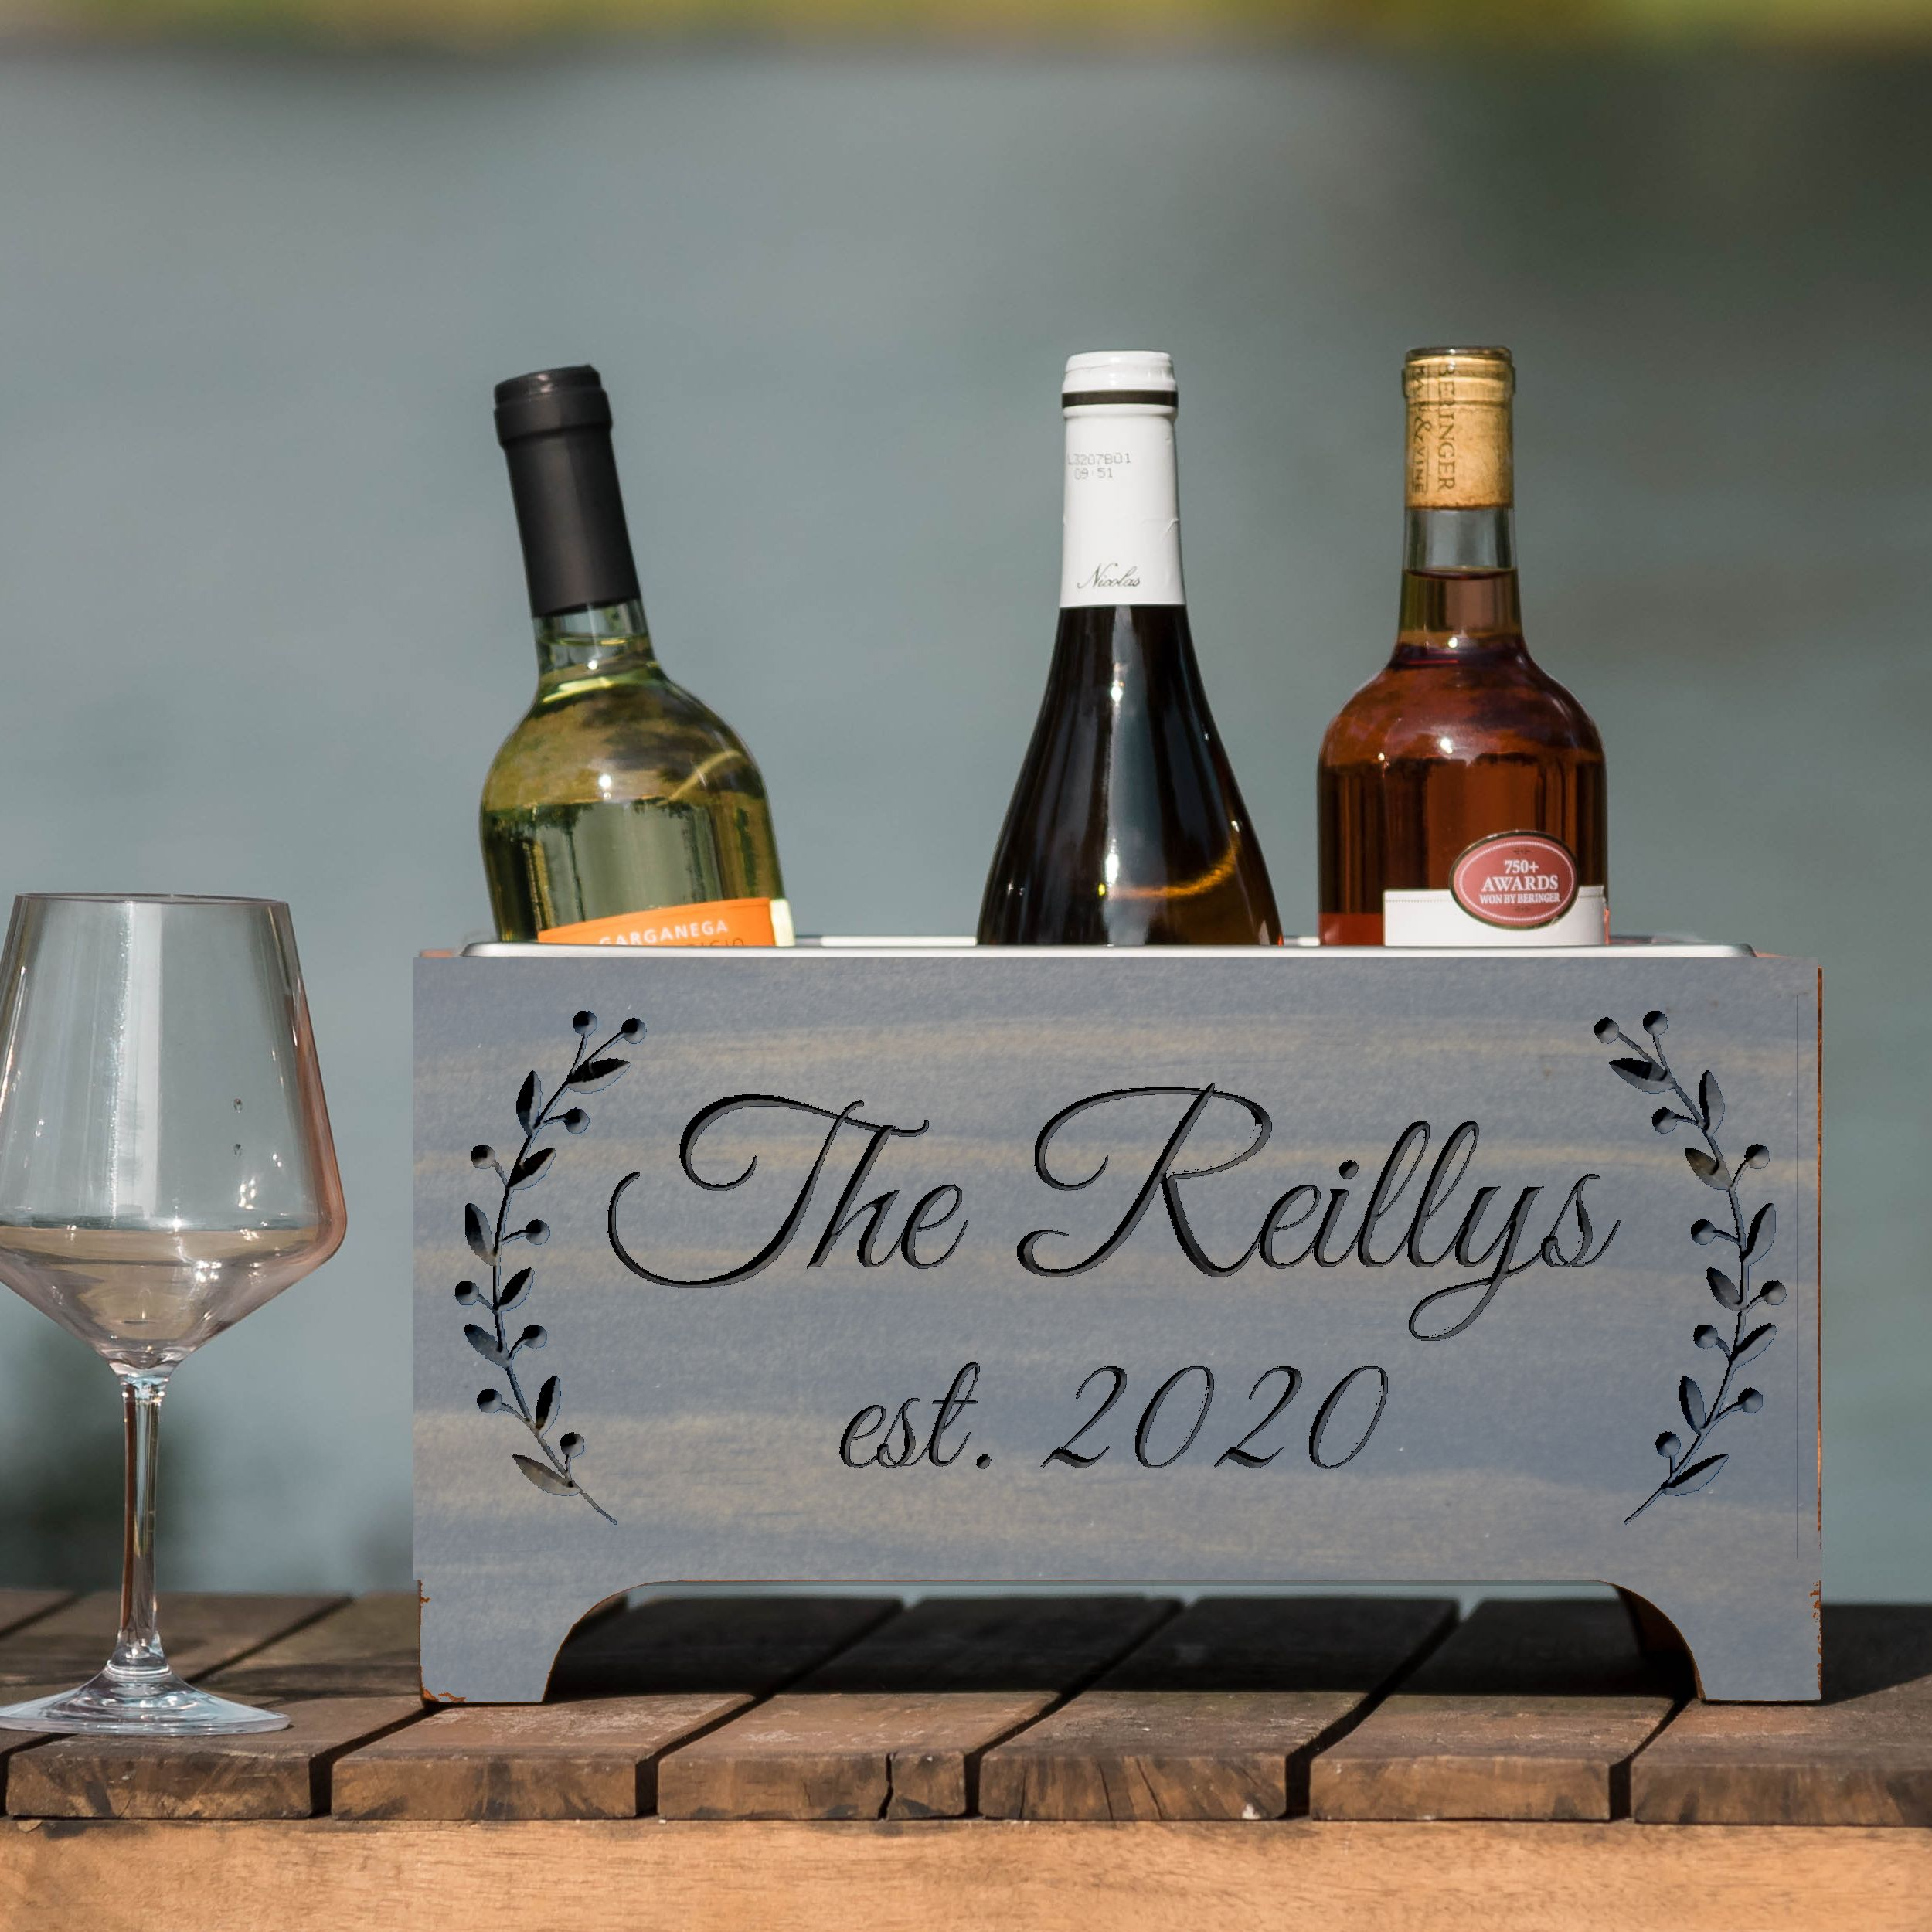 Personalized Wine Cooler Elegant in 2020 Creative